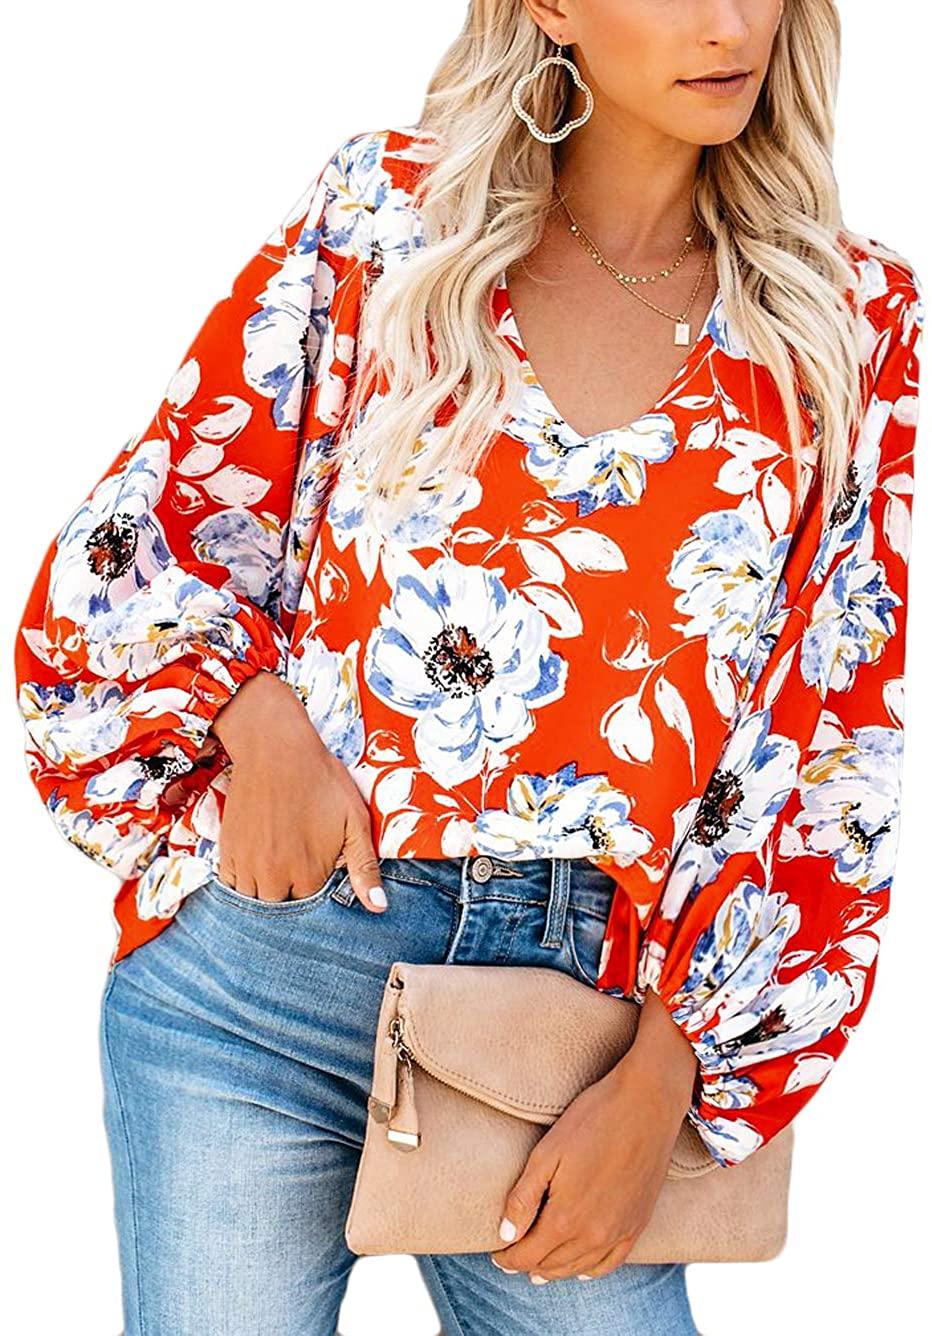 Kaei&Shi Floral Print Tops for Women,Bohemian Lantern Sleeve Blouse,Oversized Chiffon Shirt